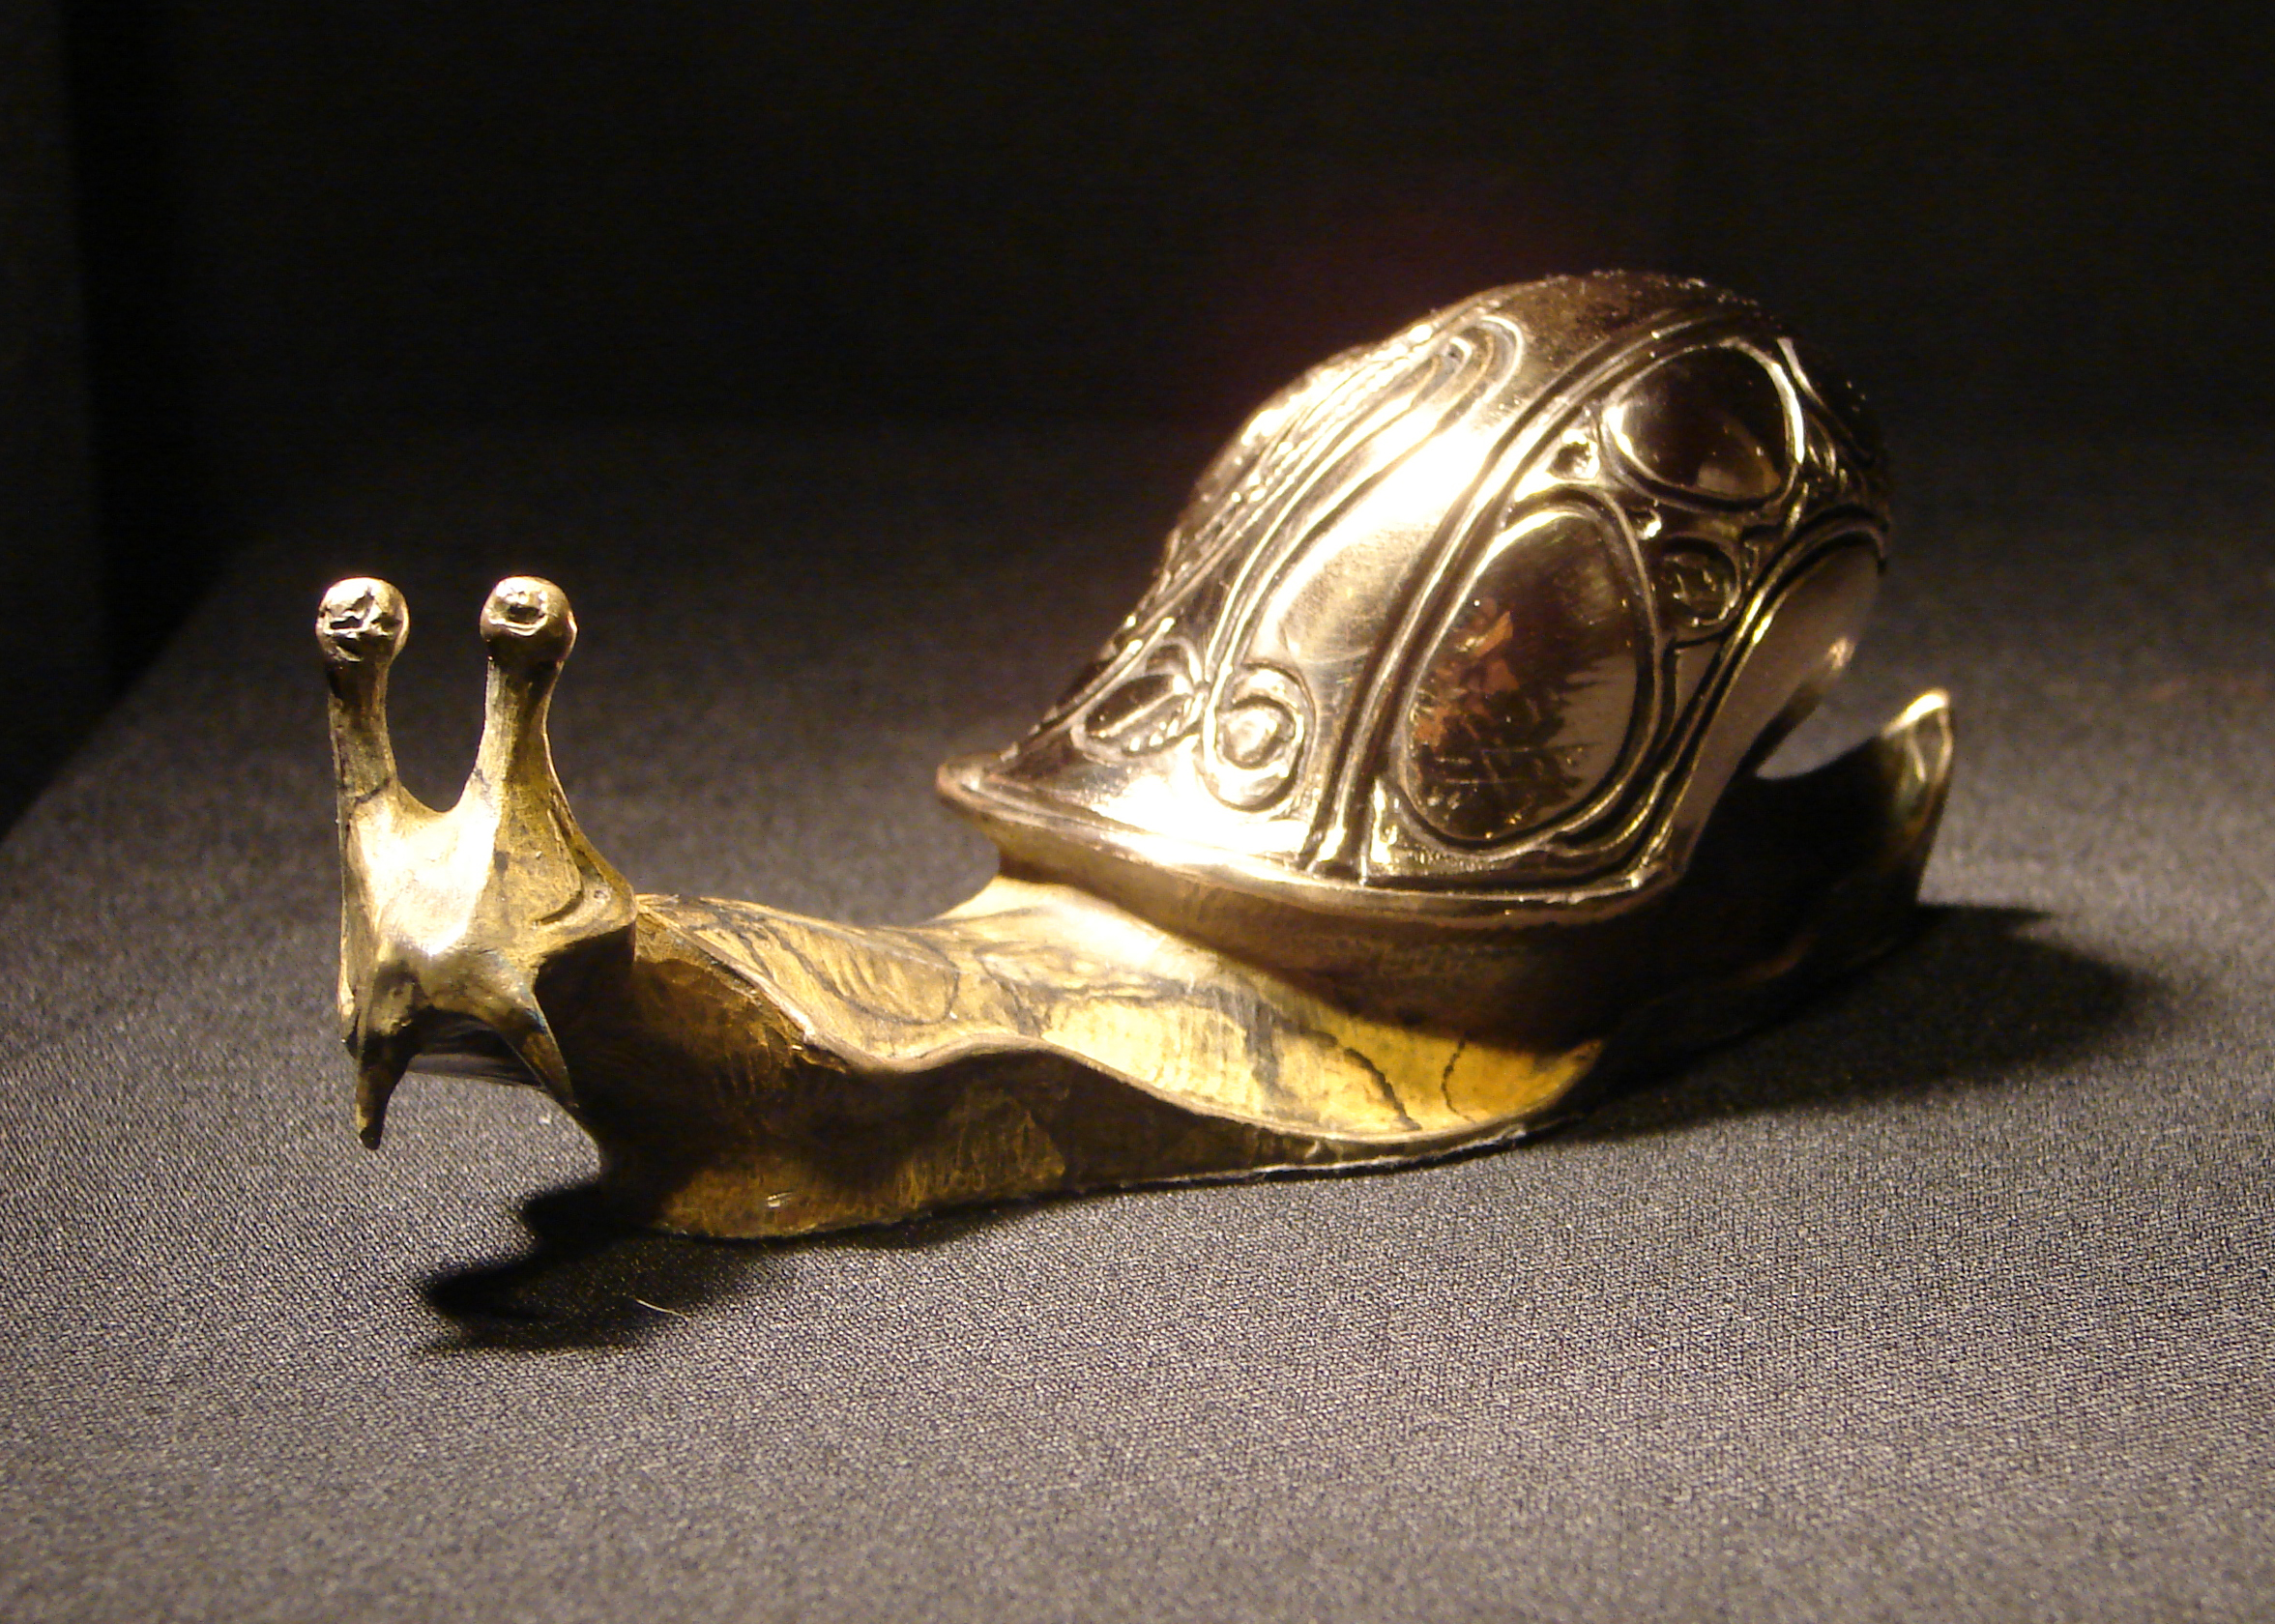 bronze-medium-snail-sculpture-john-maisano-2.jpg